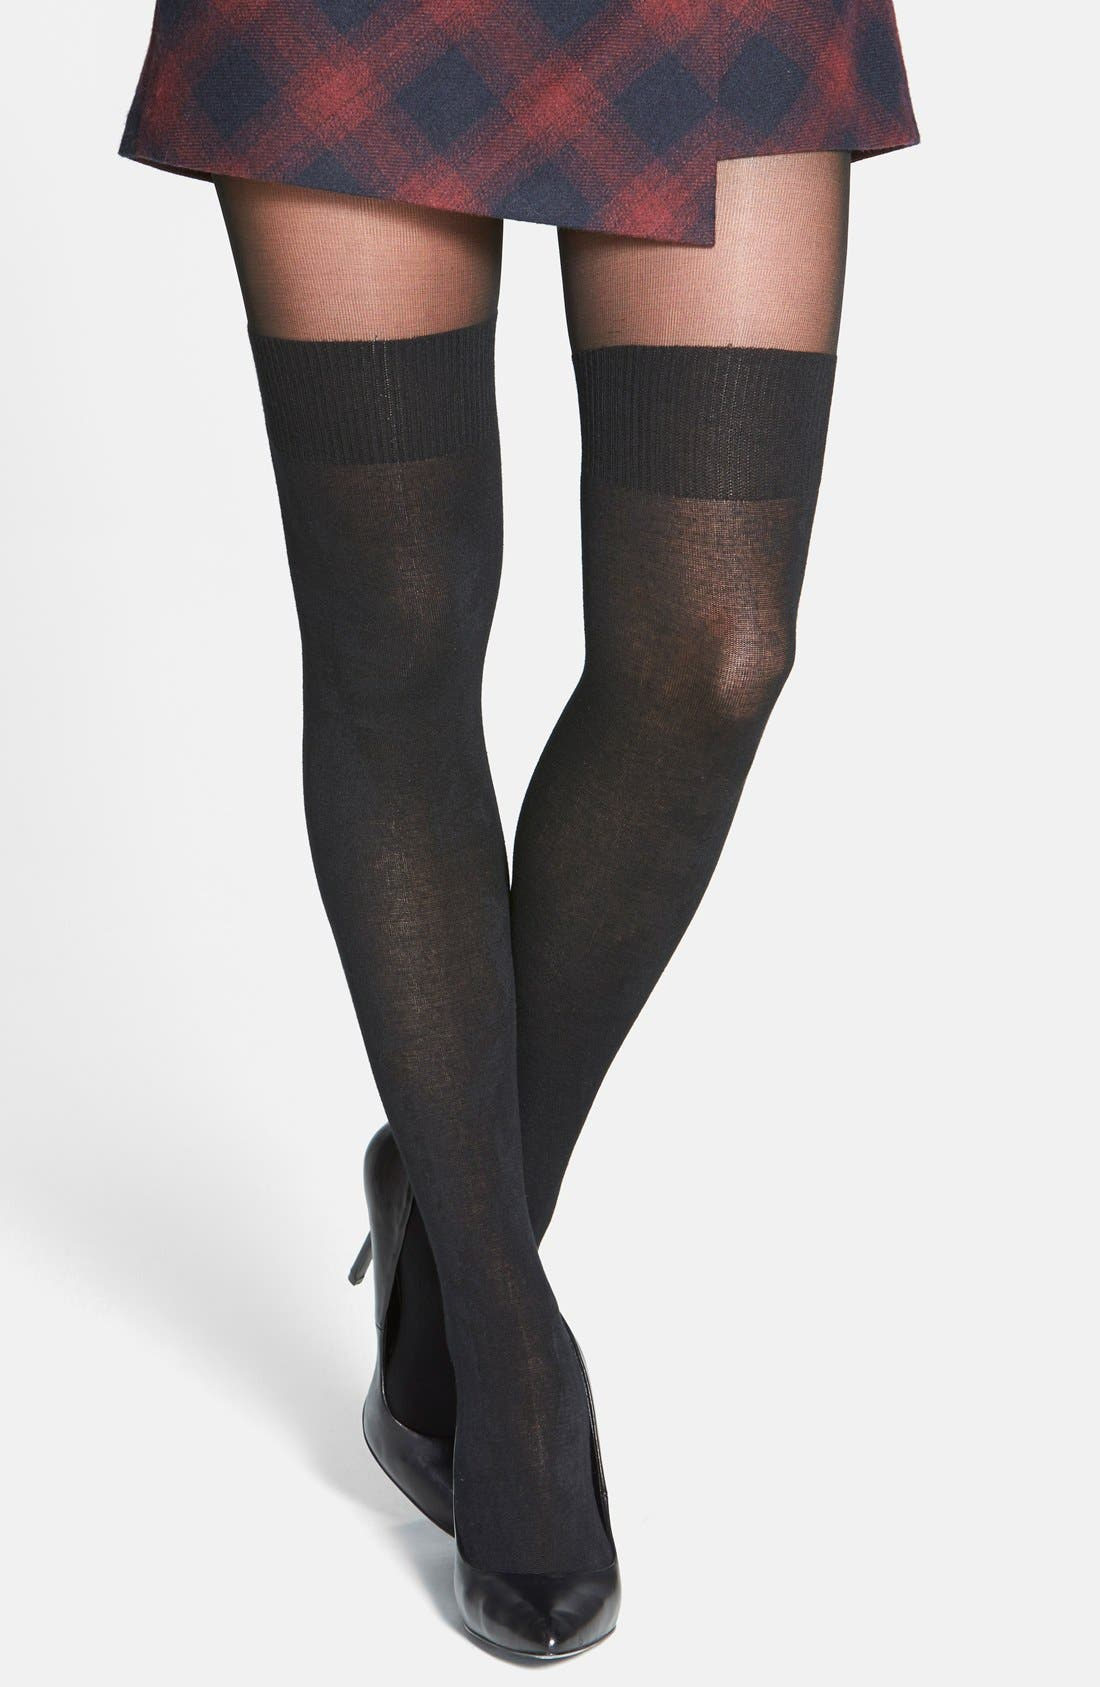 Main Image - Pretty Polly 'Secret Socks' Tights